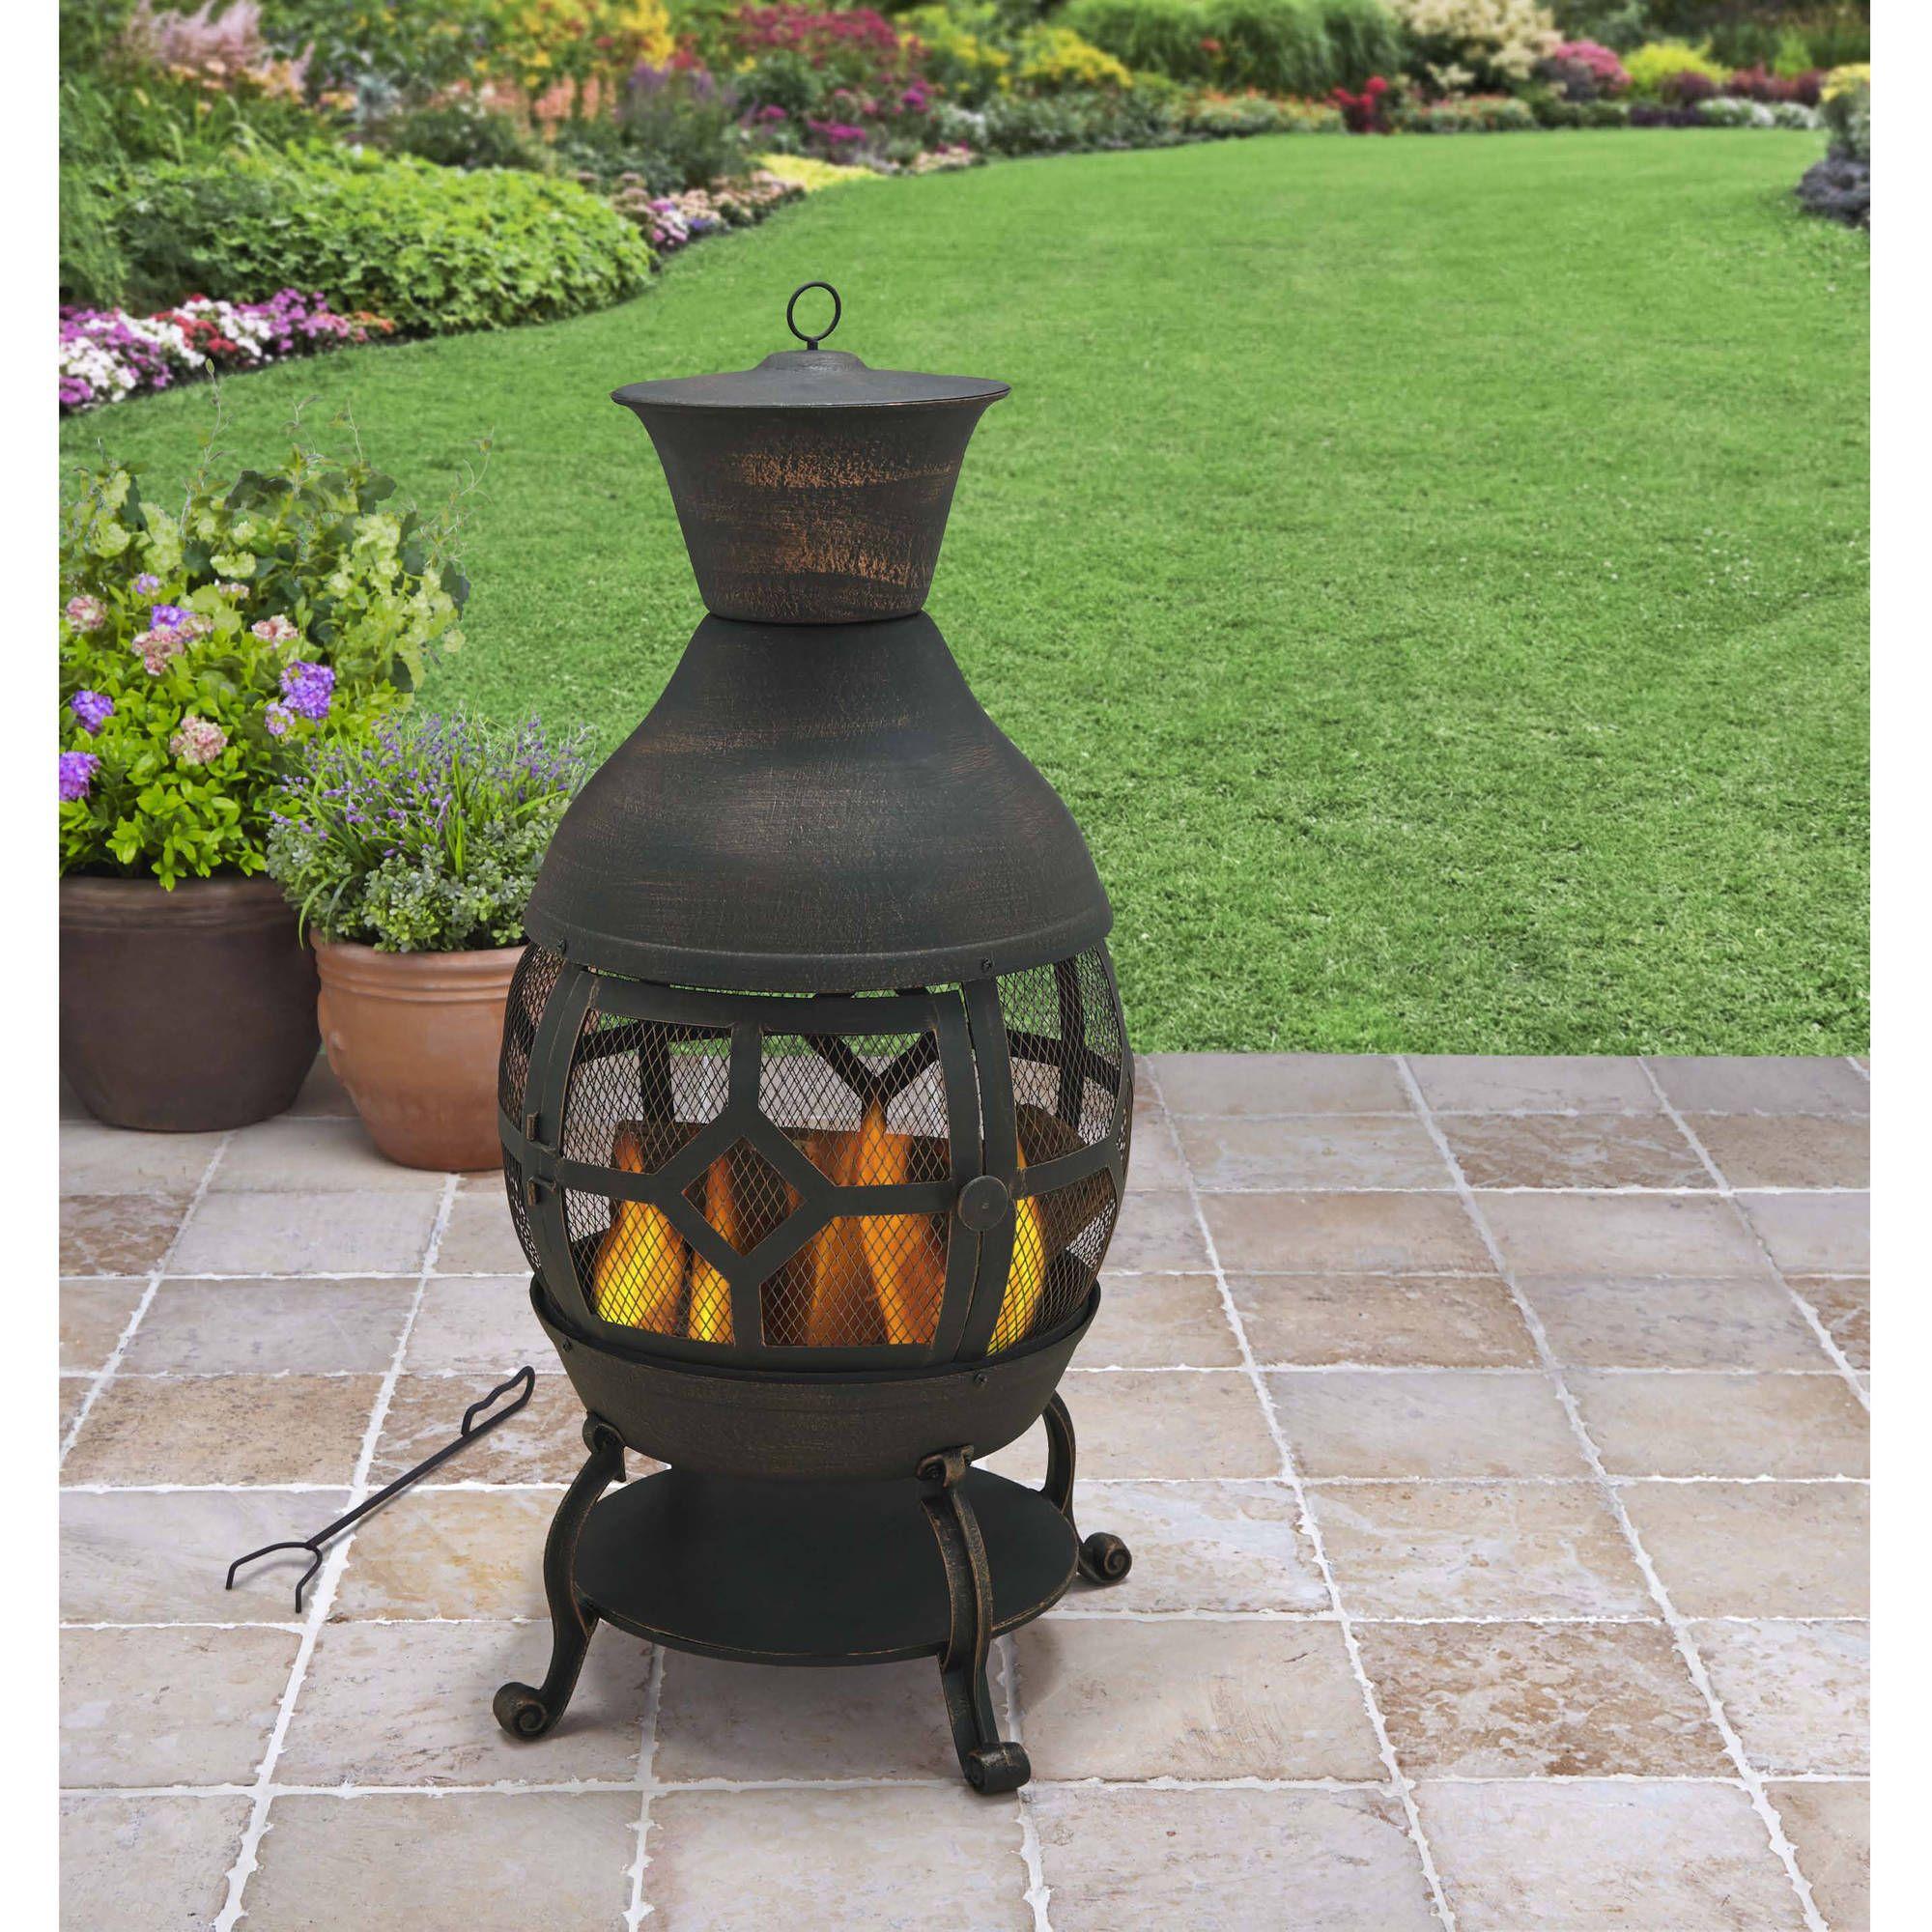 Cast Iron Chimenea Fireplace Antique Bronze Outdoor Living Patio Fire Pit  Heat In Home U0026 Garden, Yard, Garden U0026 Outdoor Living, Outdoor Cooking U0026  Eating, ...